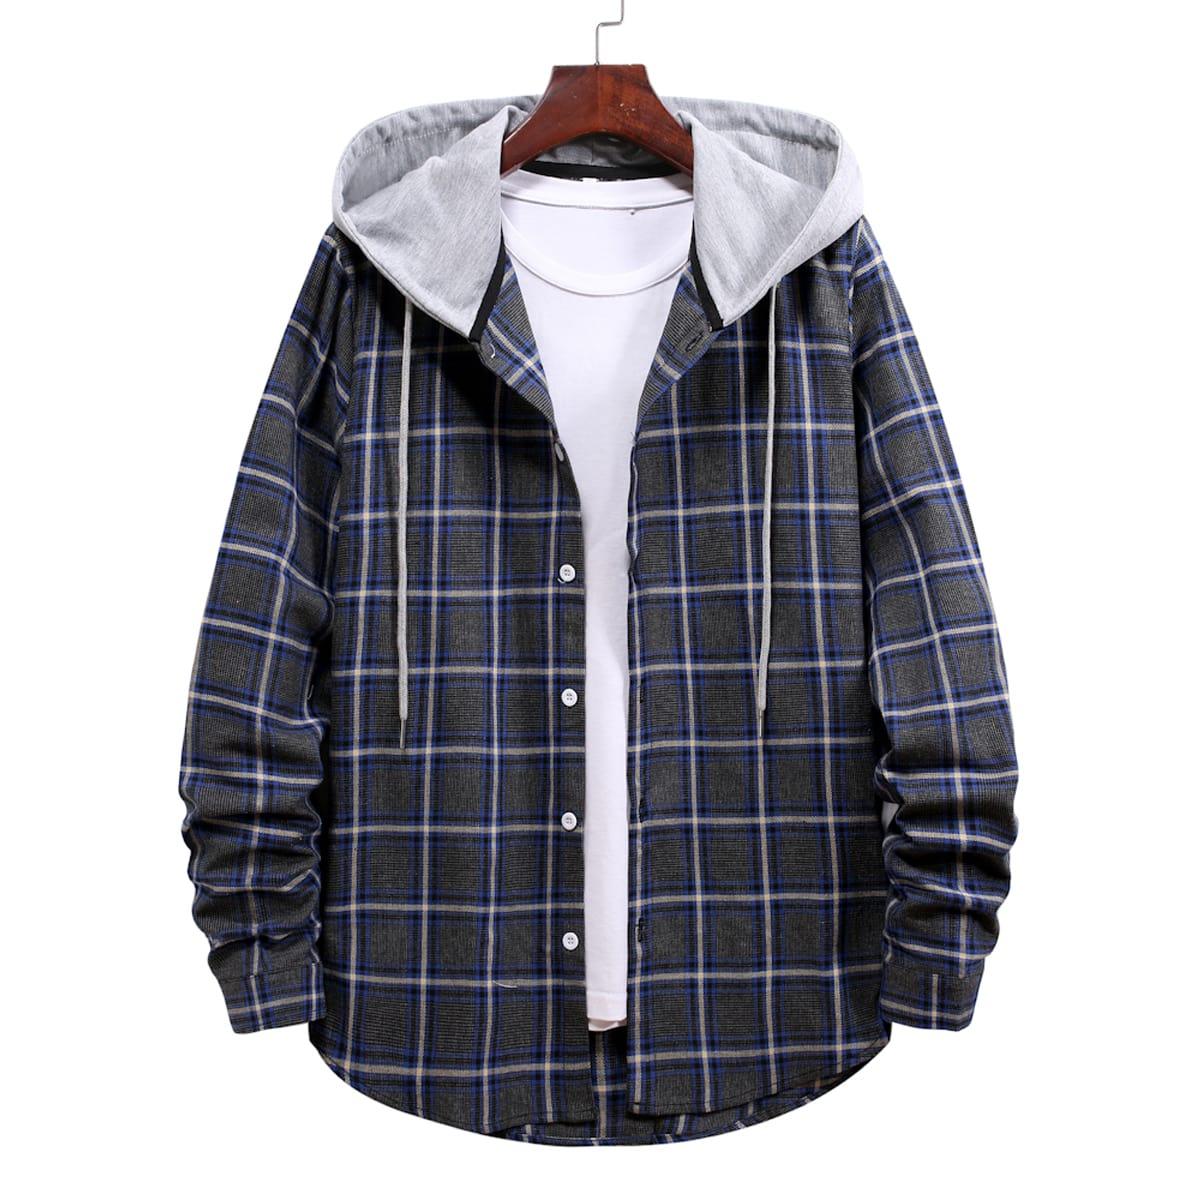 на кулиске Клетчатый Институтский Мужские рубашки SheIn rmshirt03210225408